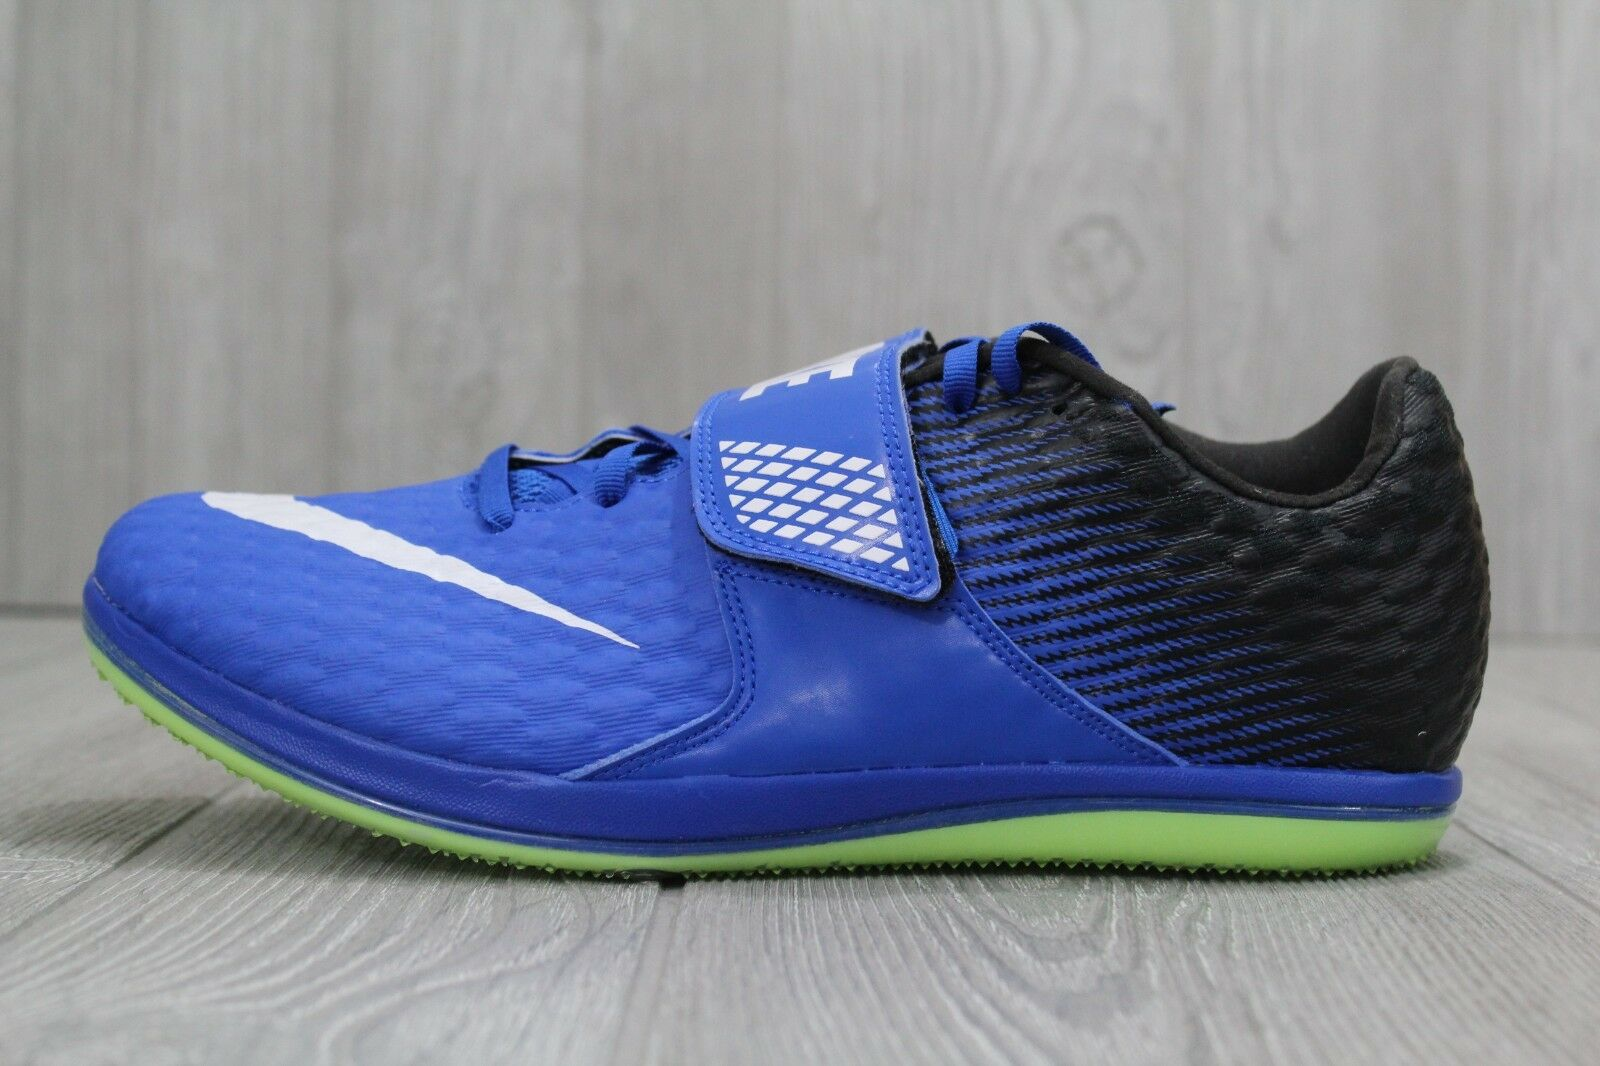 28 28 28 New Nike Mens 4 -11 Zoom HJ High Jump Elite Spikes Black Blue 806561-413 e59848